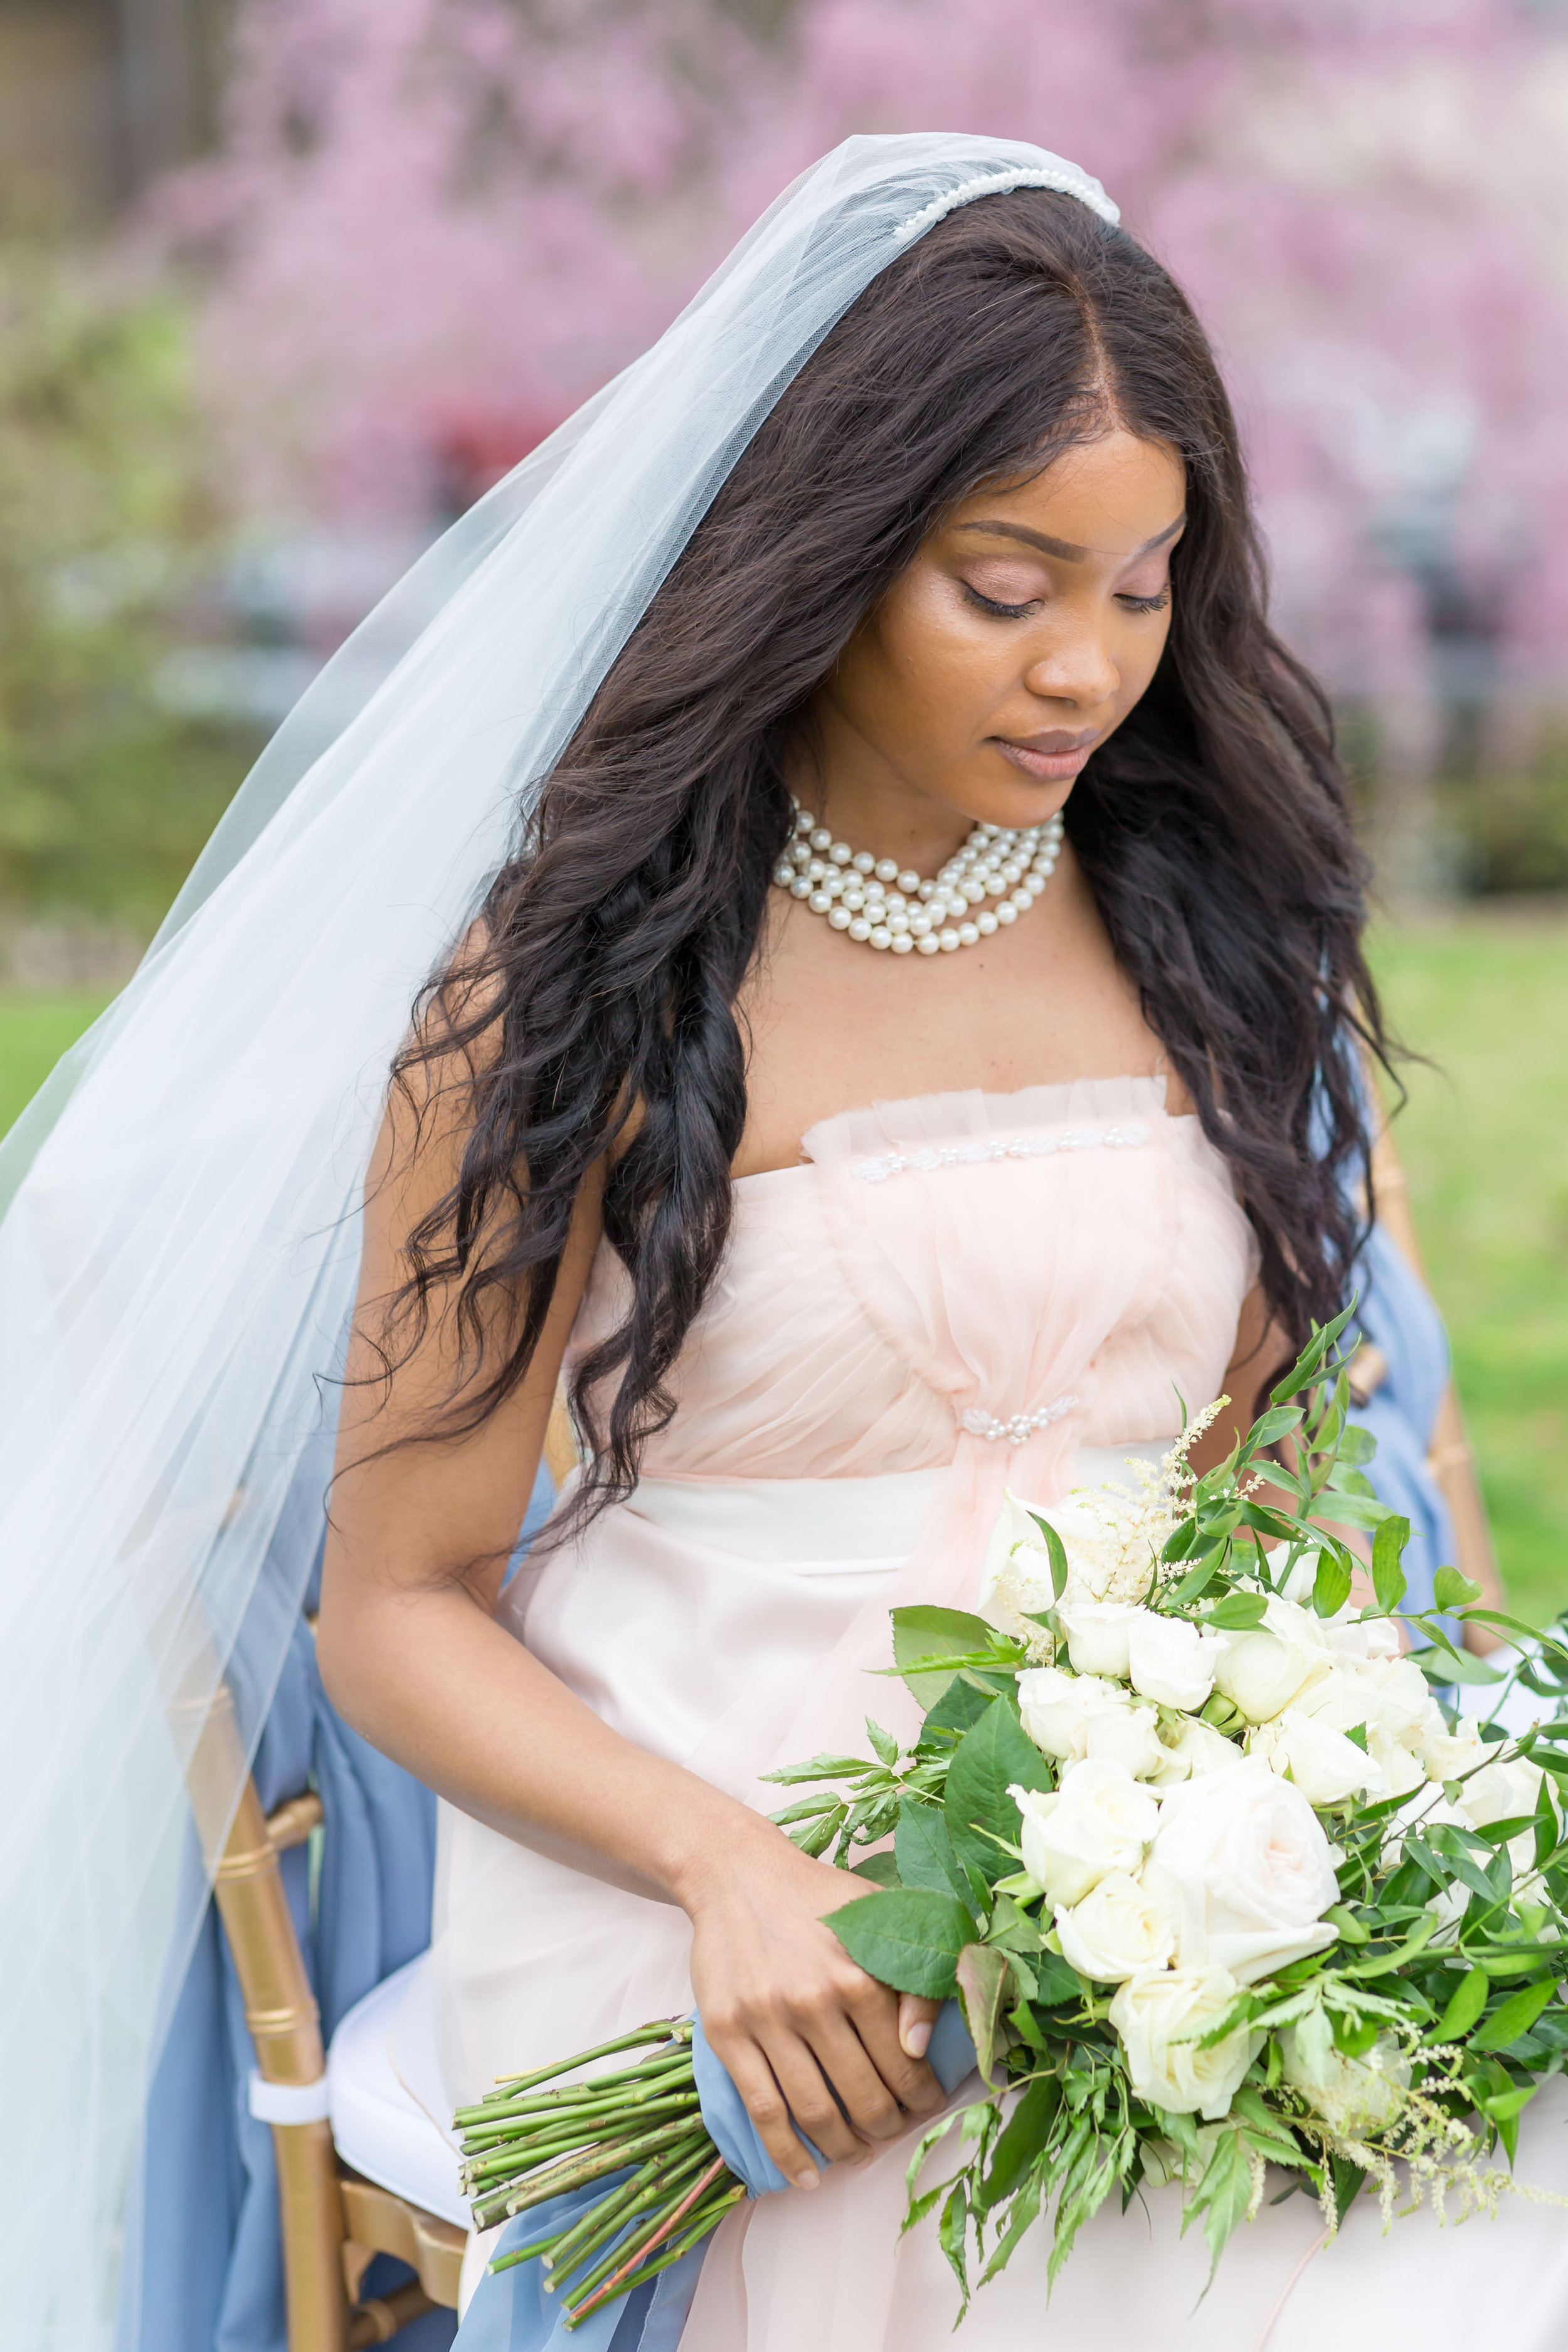 ScarlettExpressions-StyledShoot-Bridal-93.jpg